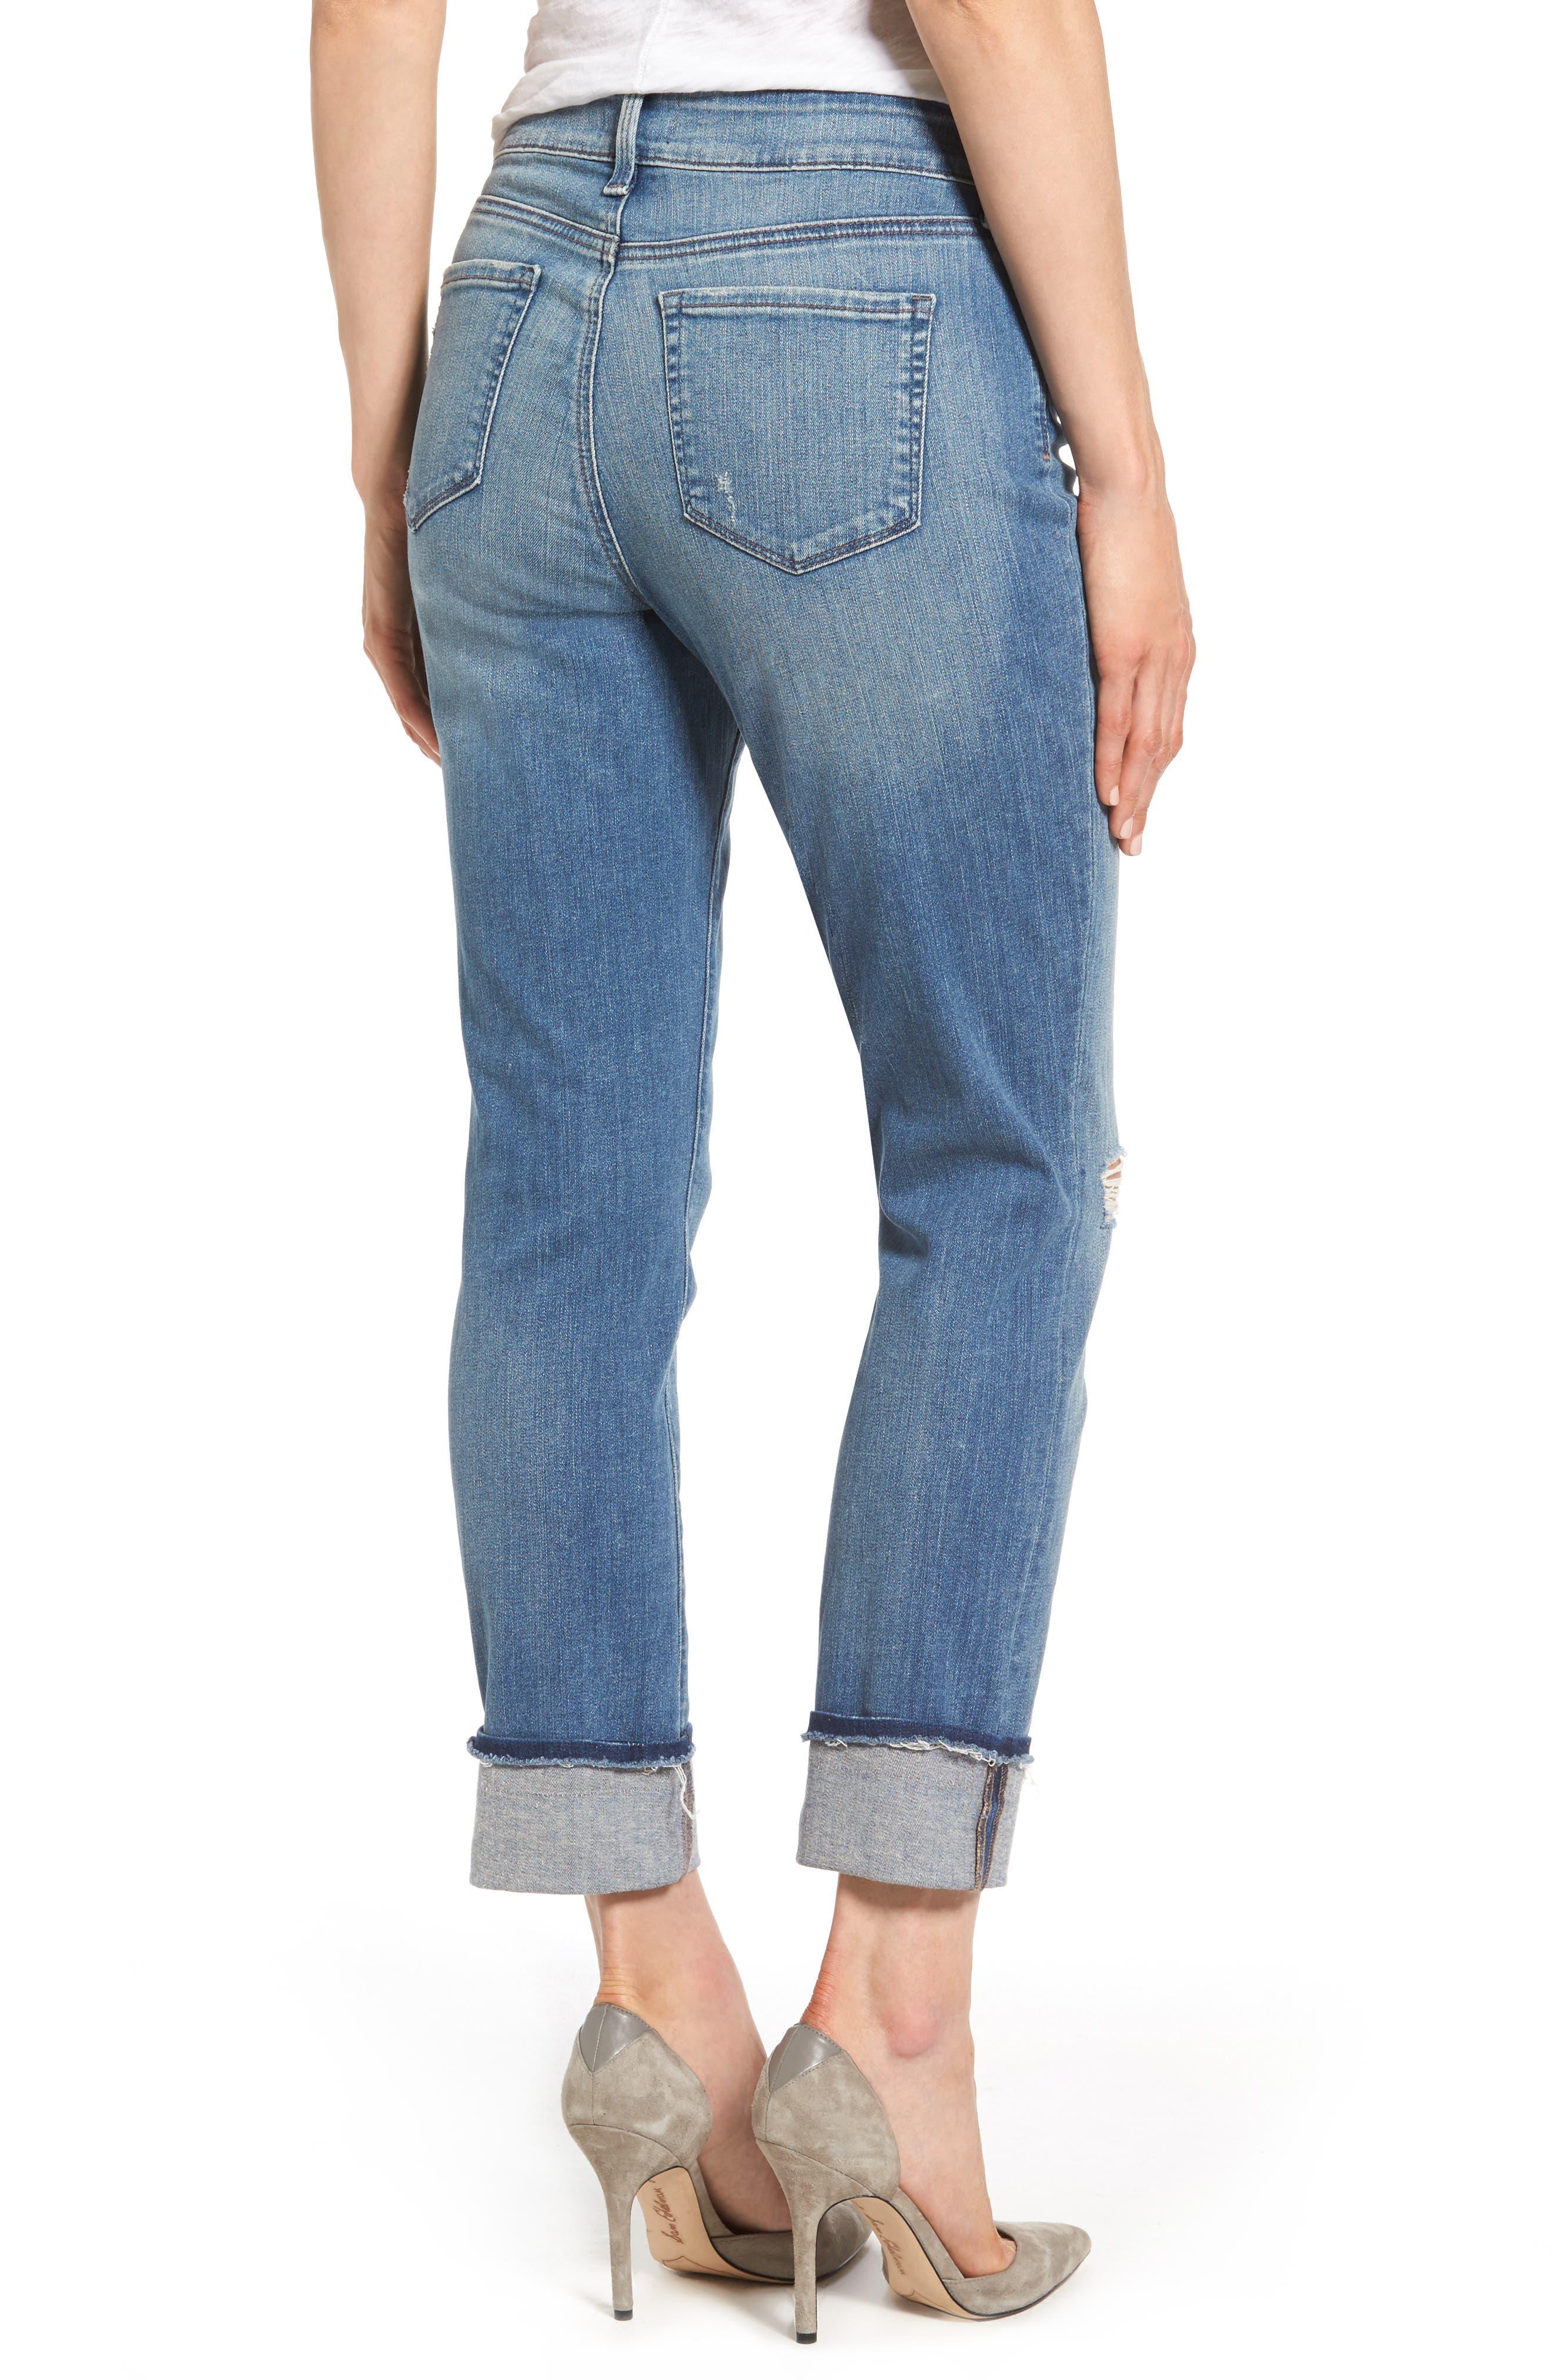 Alternate Image 2  - NYDJ Jessica Distressed Fray Cuff Boyfriend Jeans (Paloma Rip)